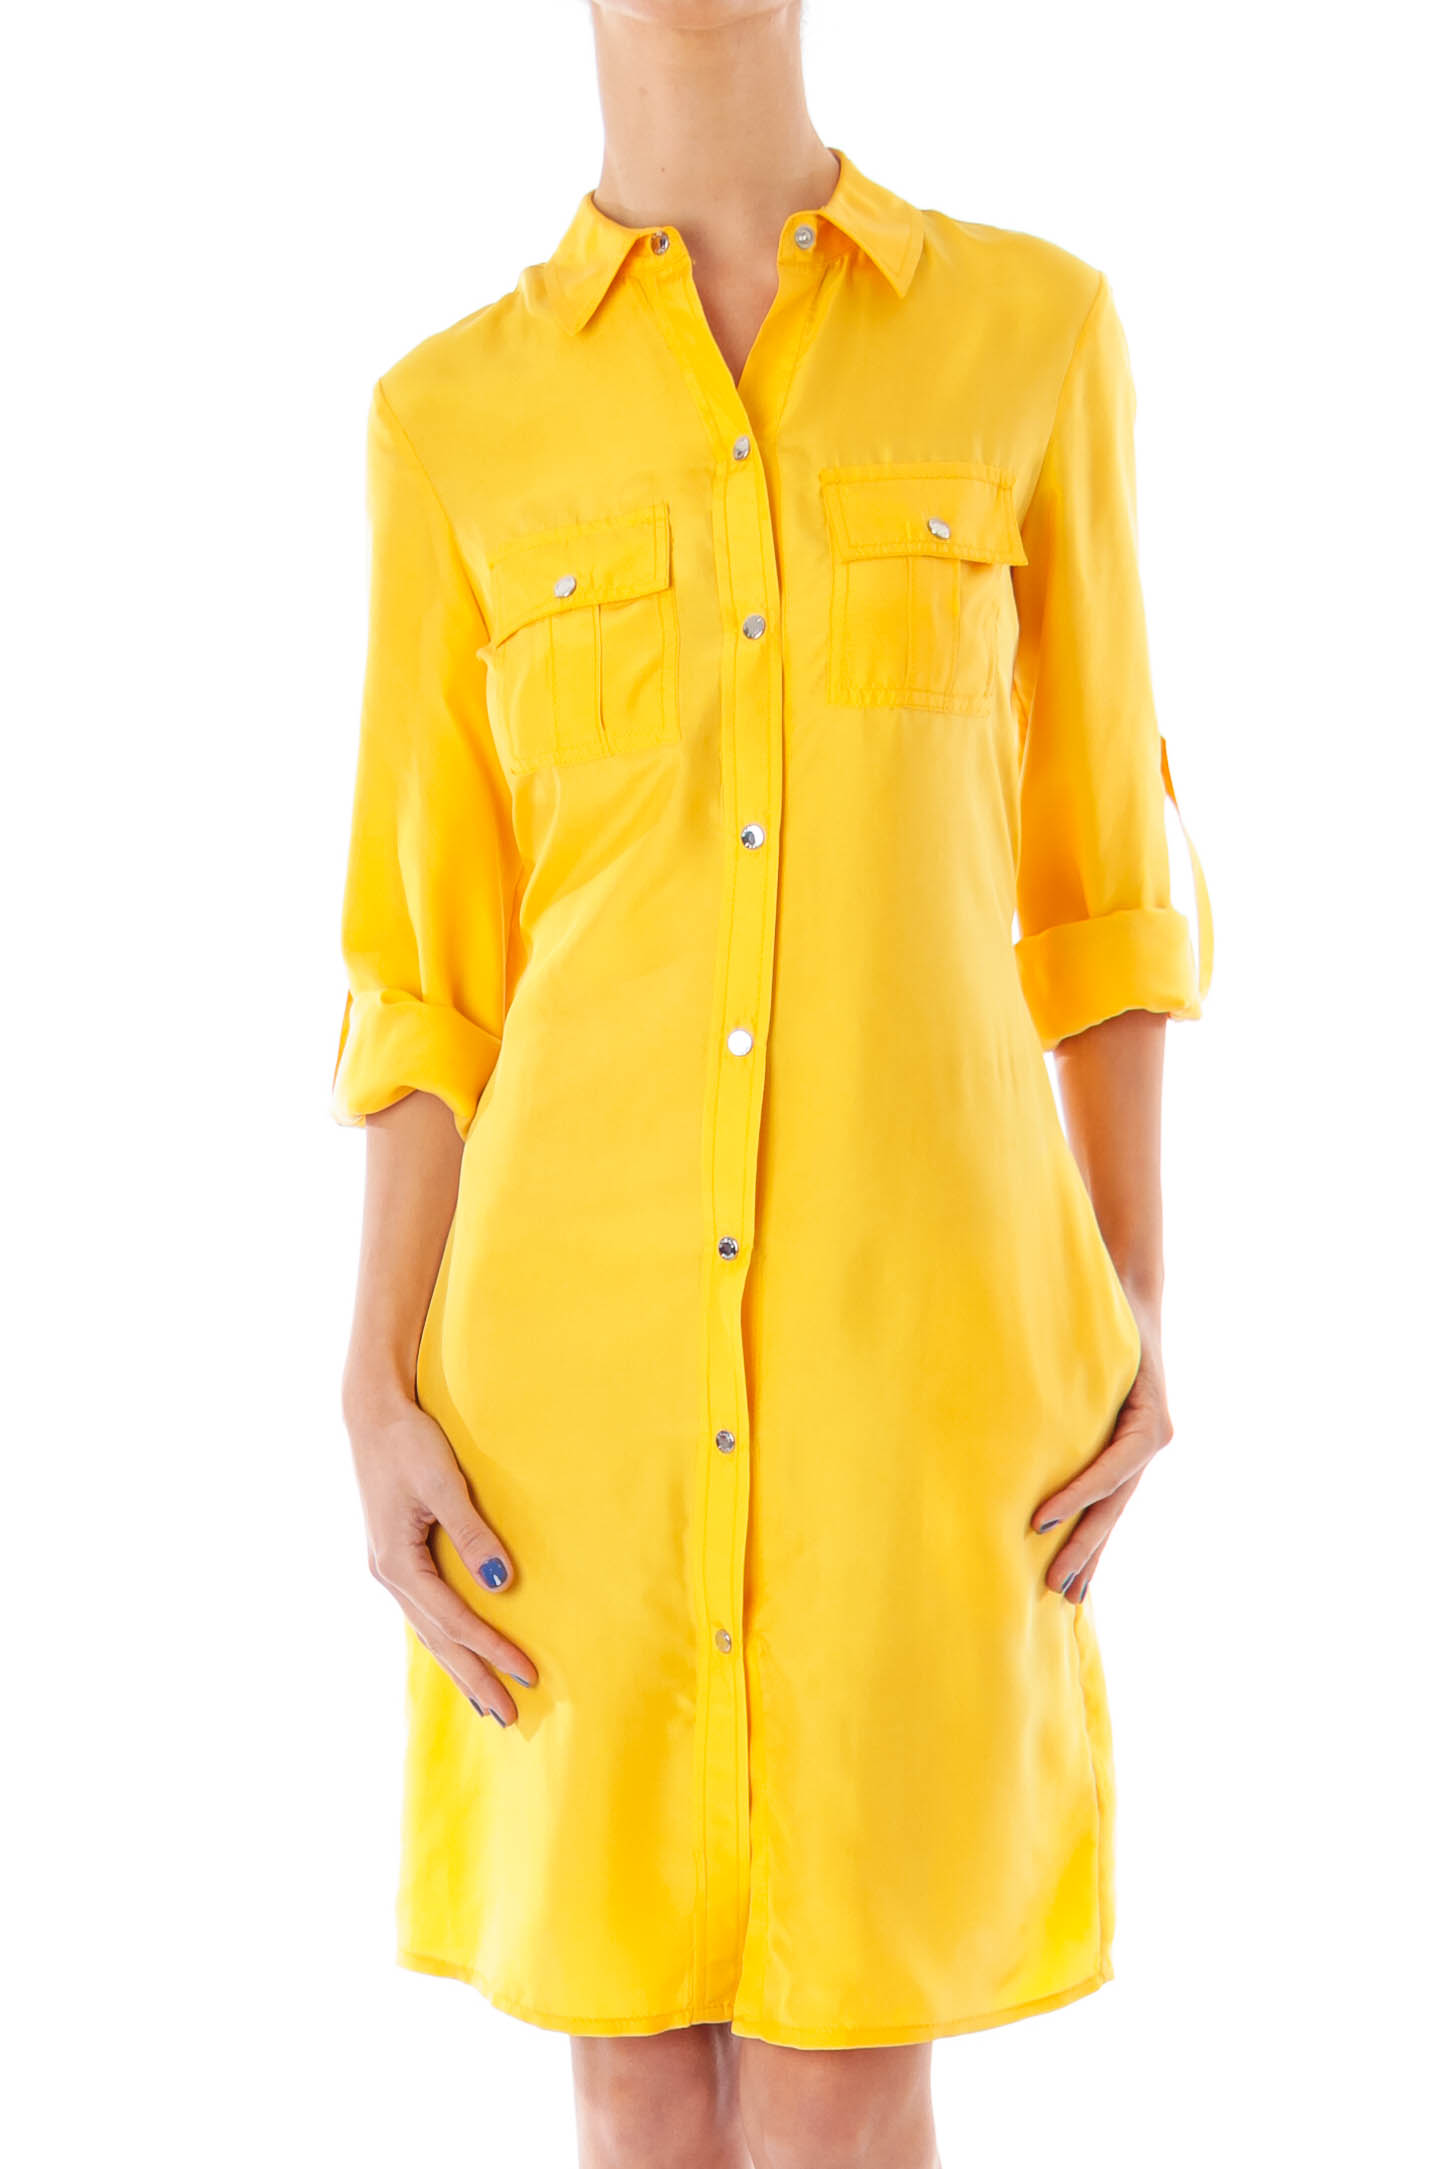 Yellow Silk Shirt Dress Xs Silkroll